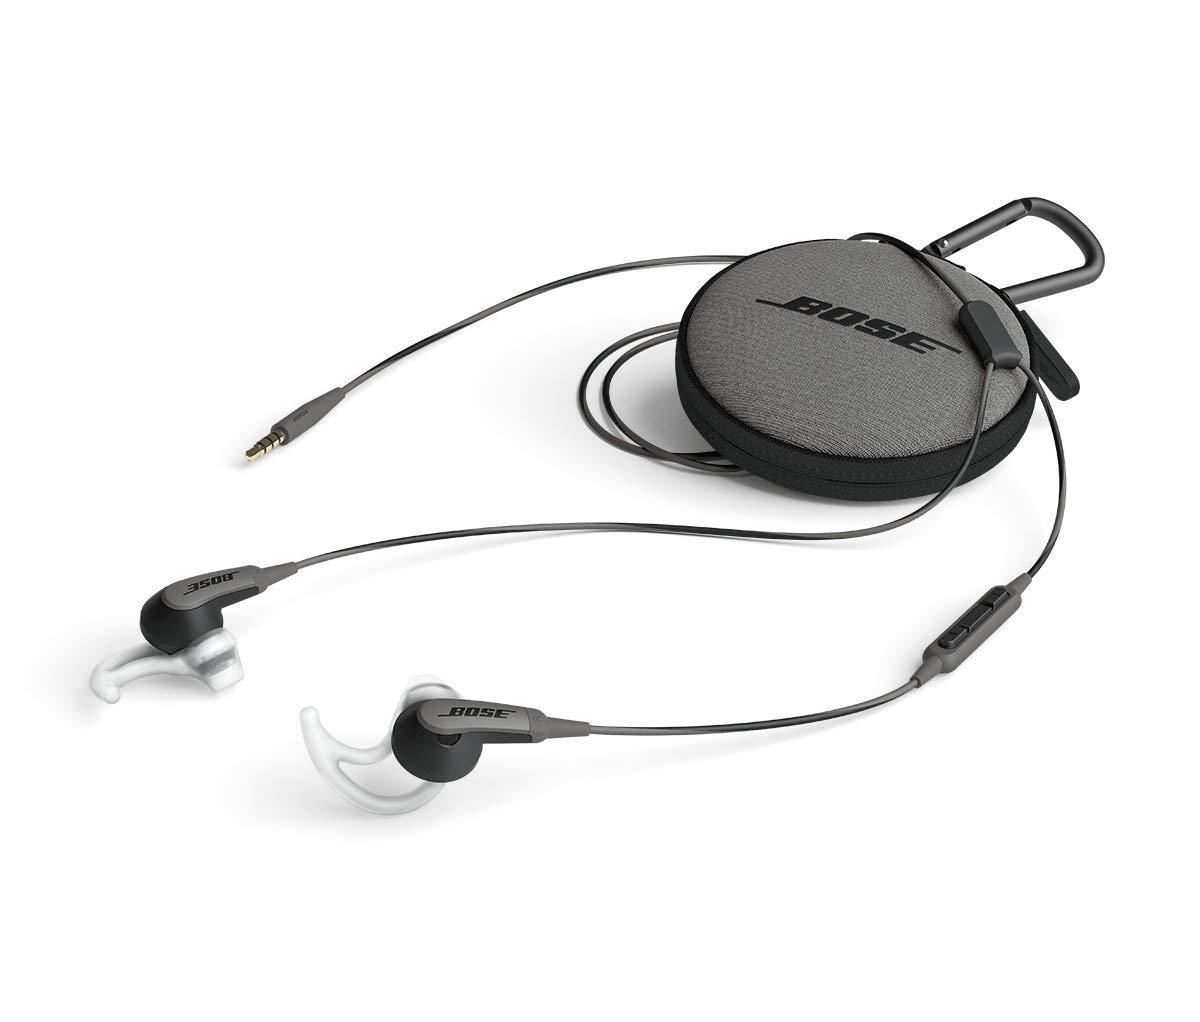 d4dd857b0d4 Amazon.com: Bose in-Ear Headphones/Earphones: Home Audio & Theater